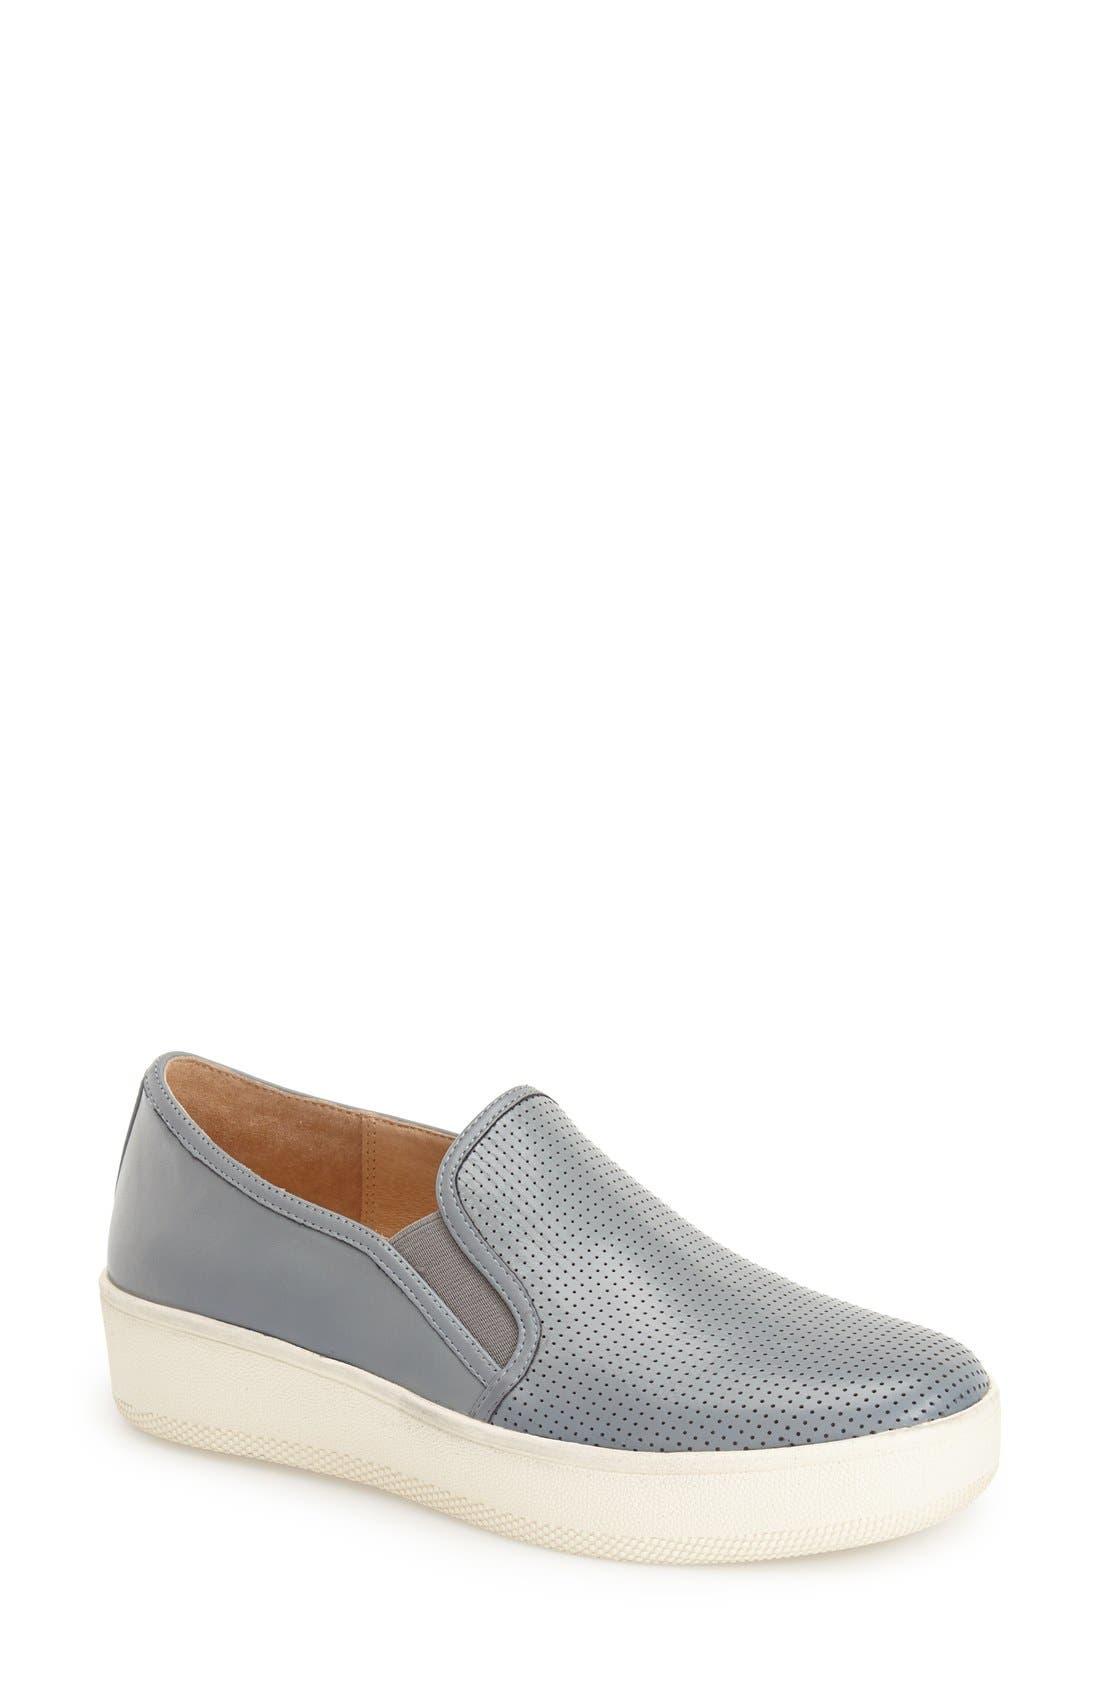 Alternate Image 1 Selected - JSlides 'Jibbie' Slip-On Platform Sneaker (Women)